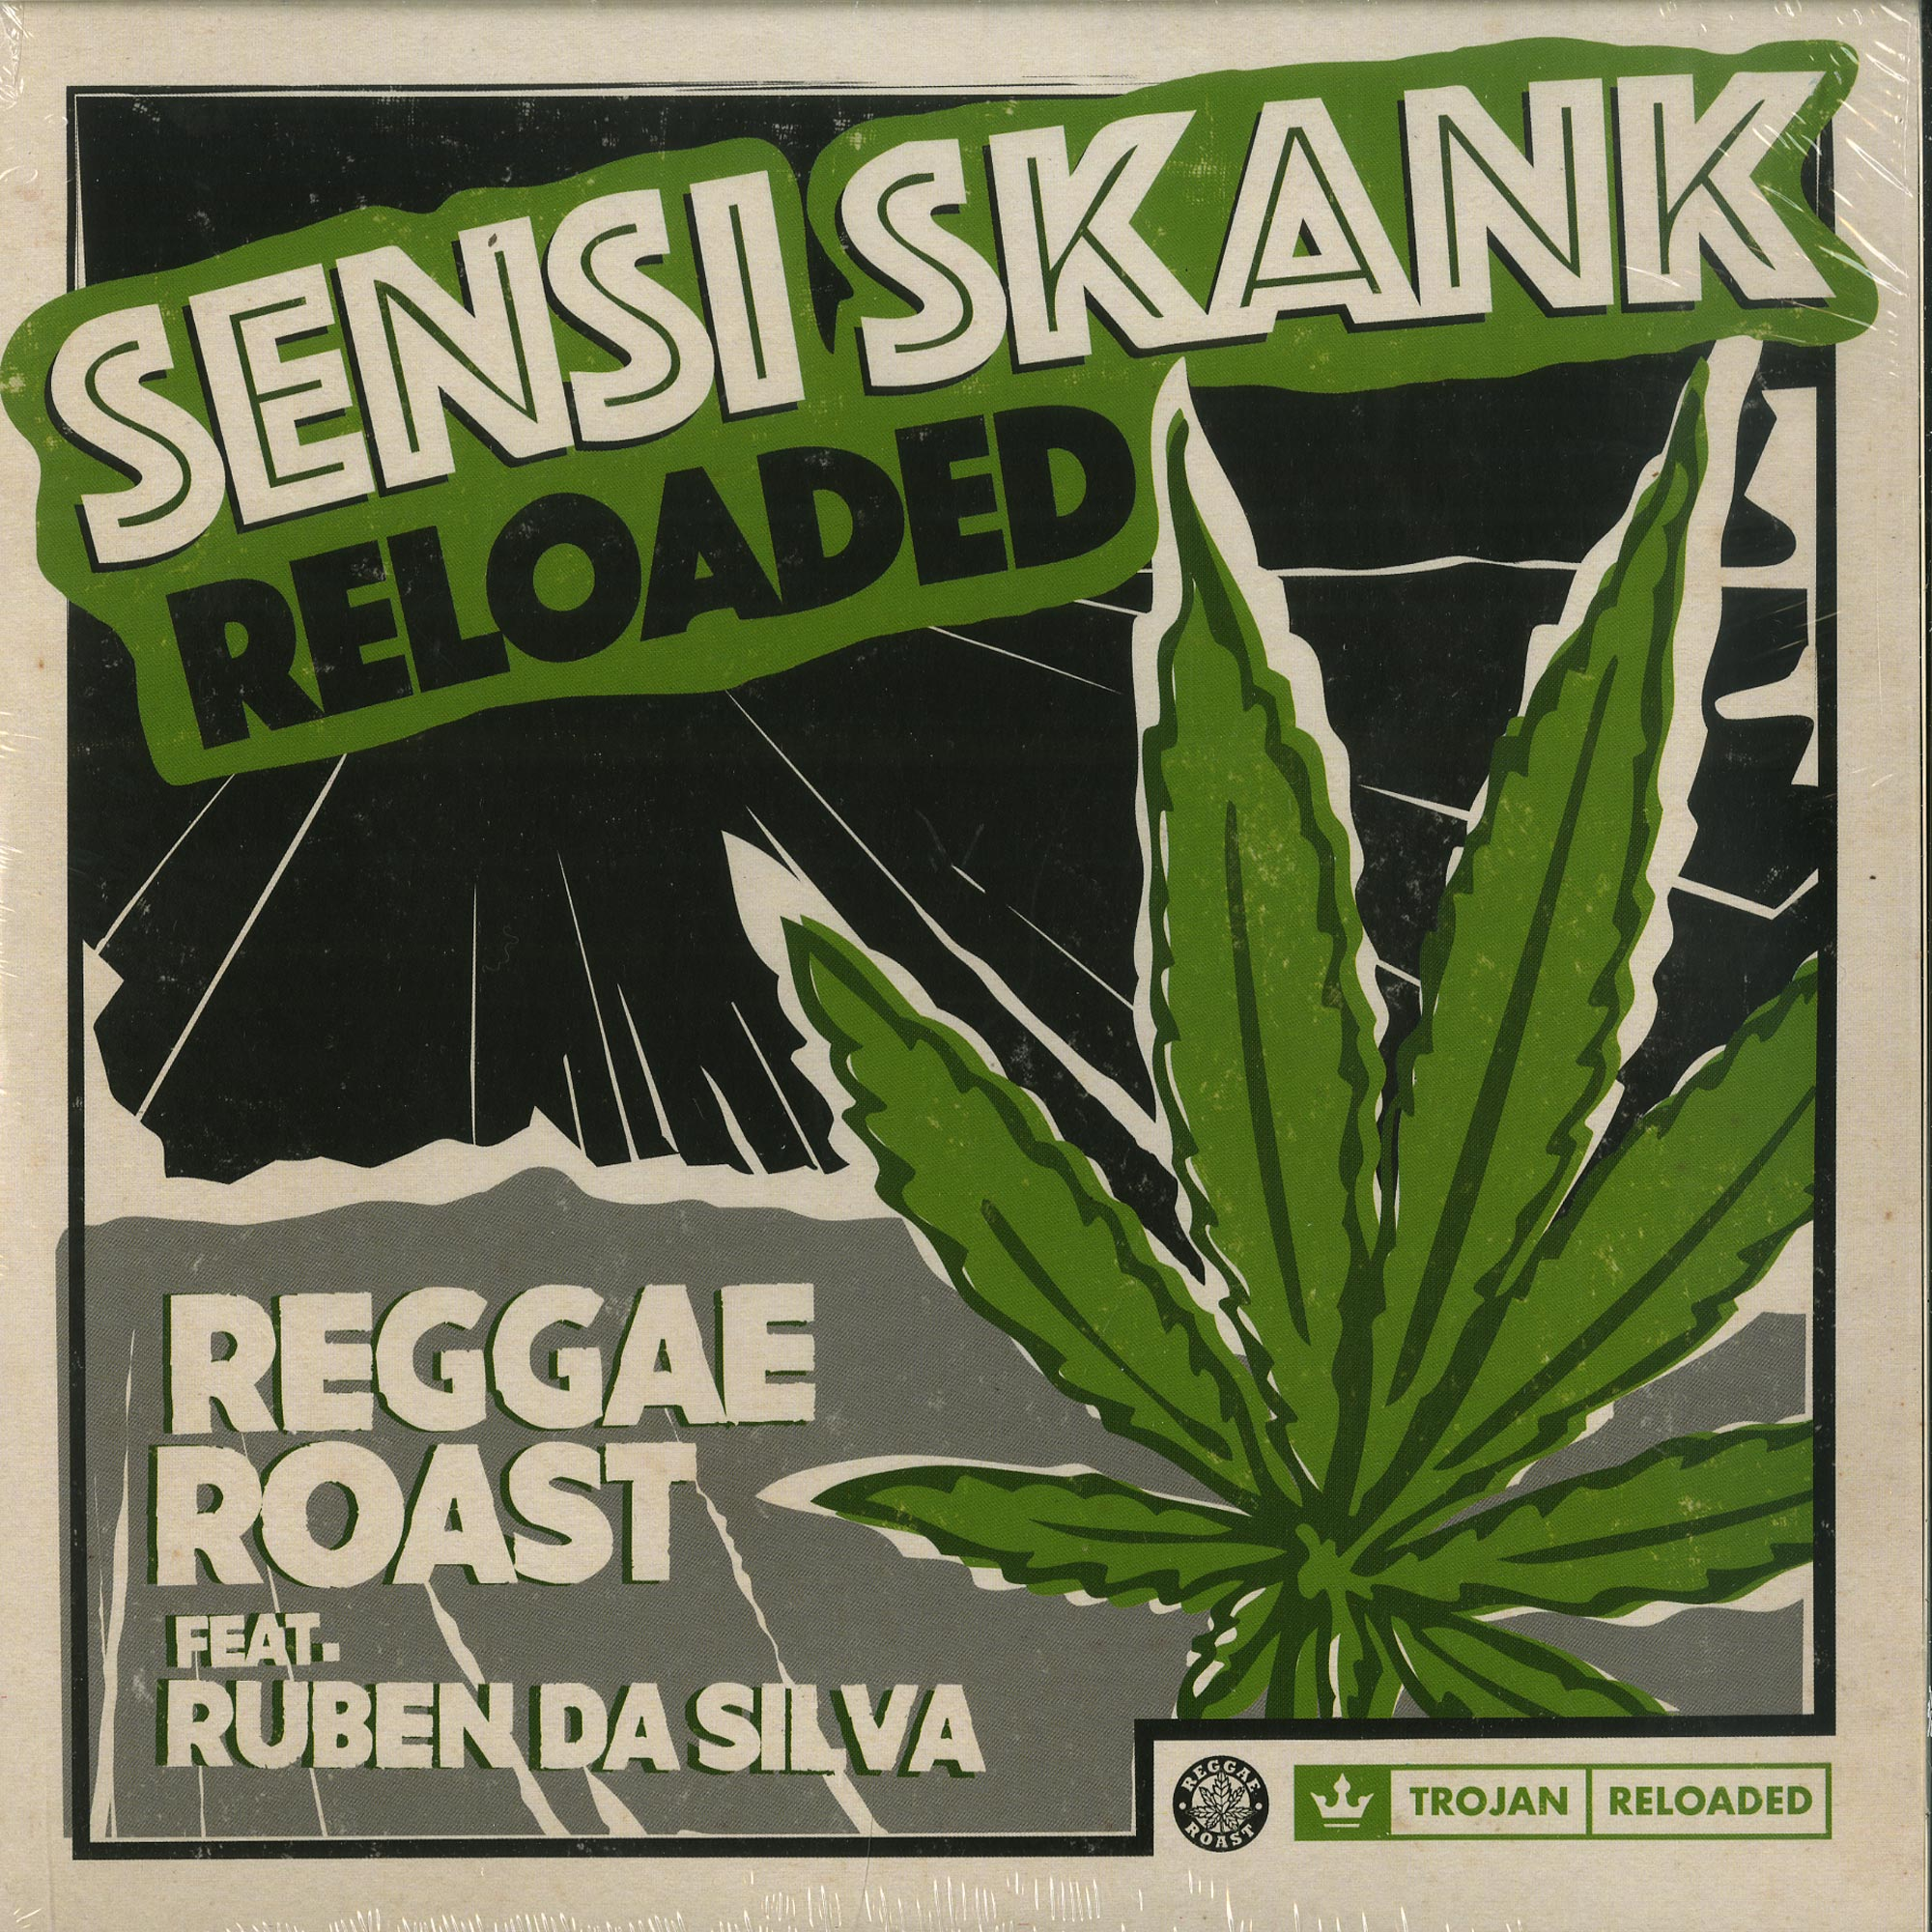 Reggae Roast - SENSI SKANK EP